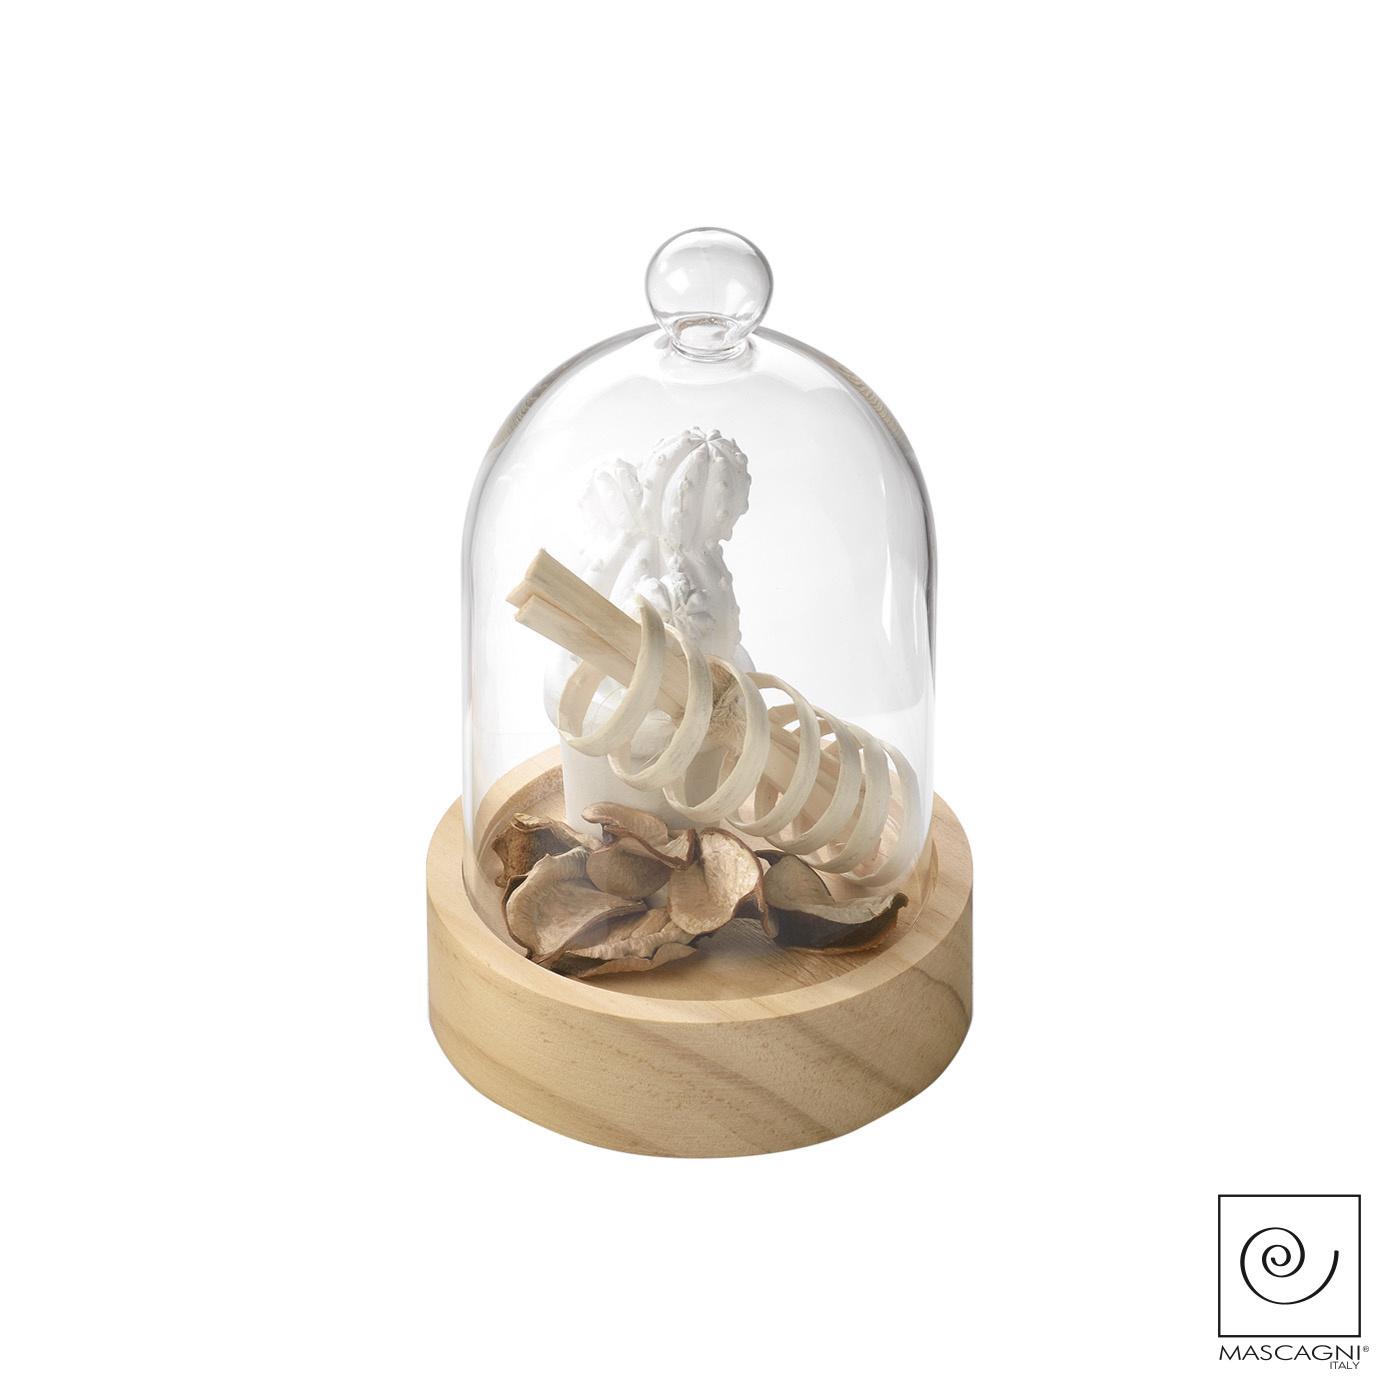 Art Mascagni A927 BELL JAR